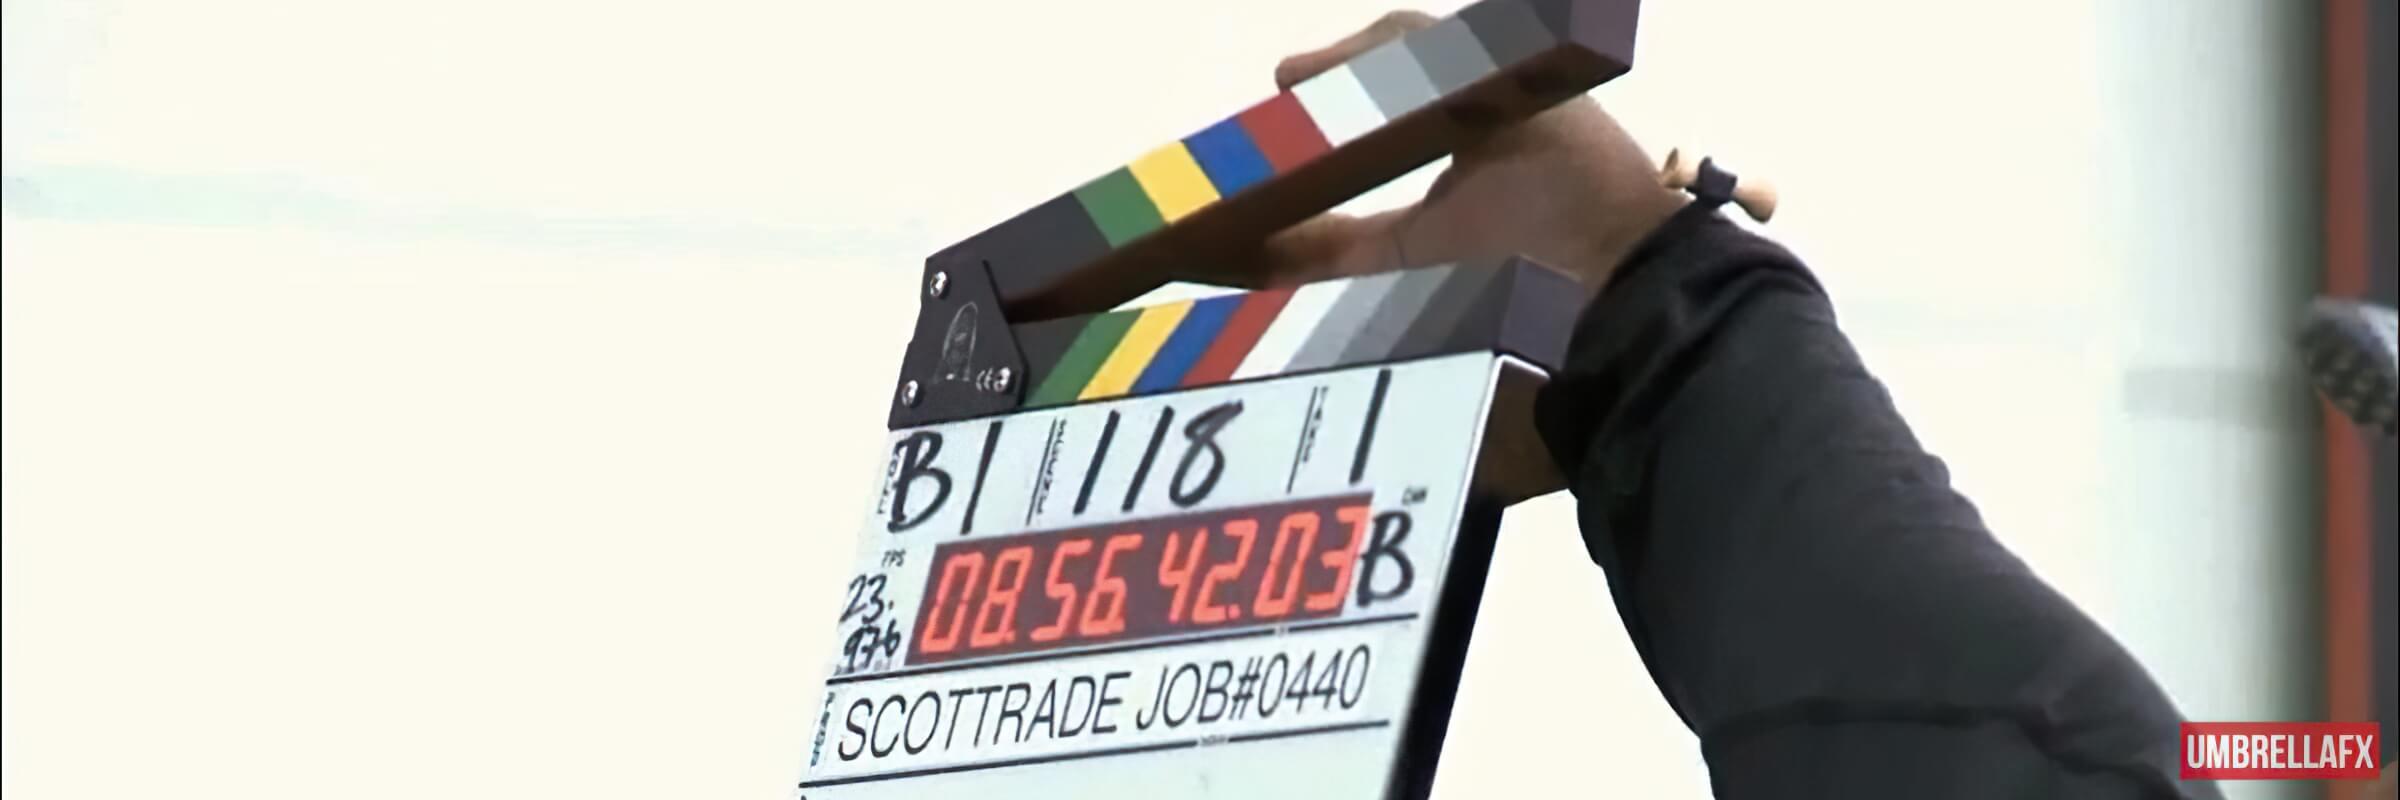 UmbrellaFX_On_the_Set_Scottrade_09-1